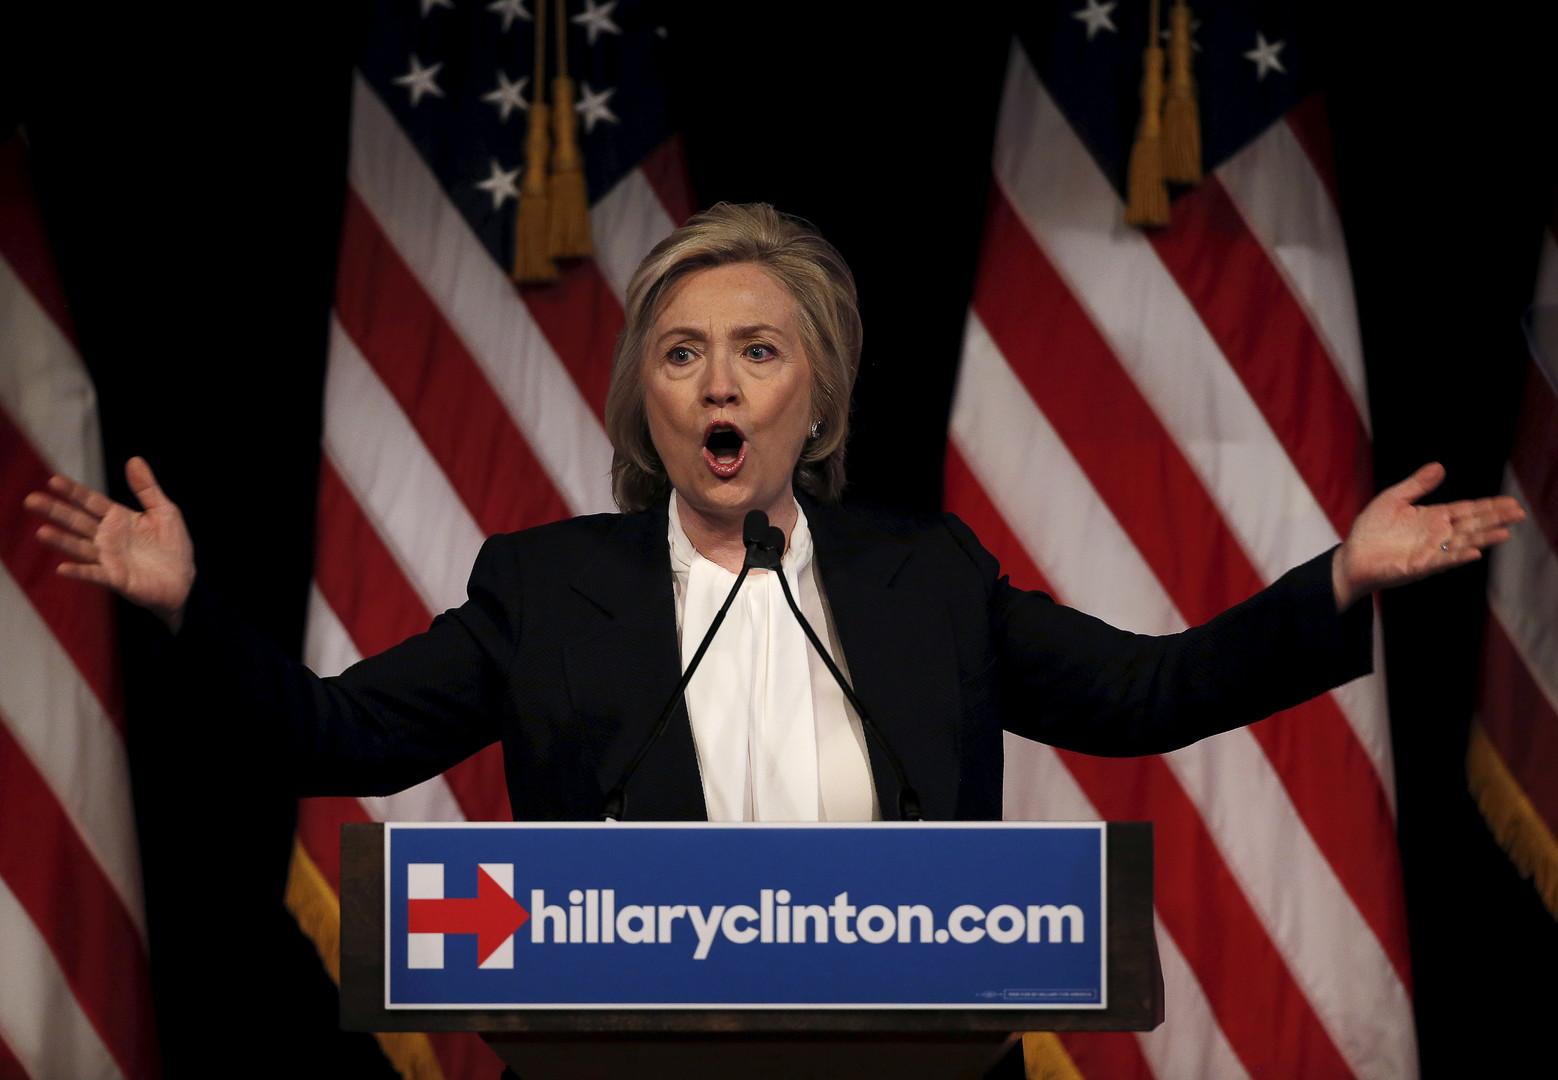 «Удали свой аккаунт»: Клинтон установила рекорд в Twitter благодаря перепалке с Трампом